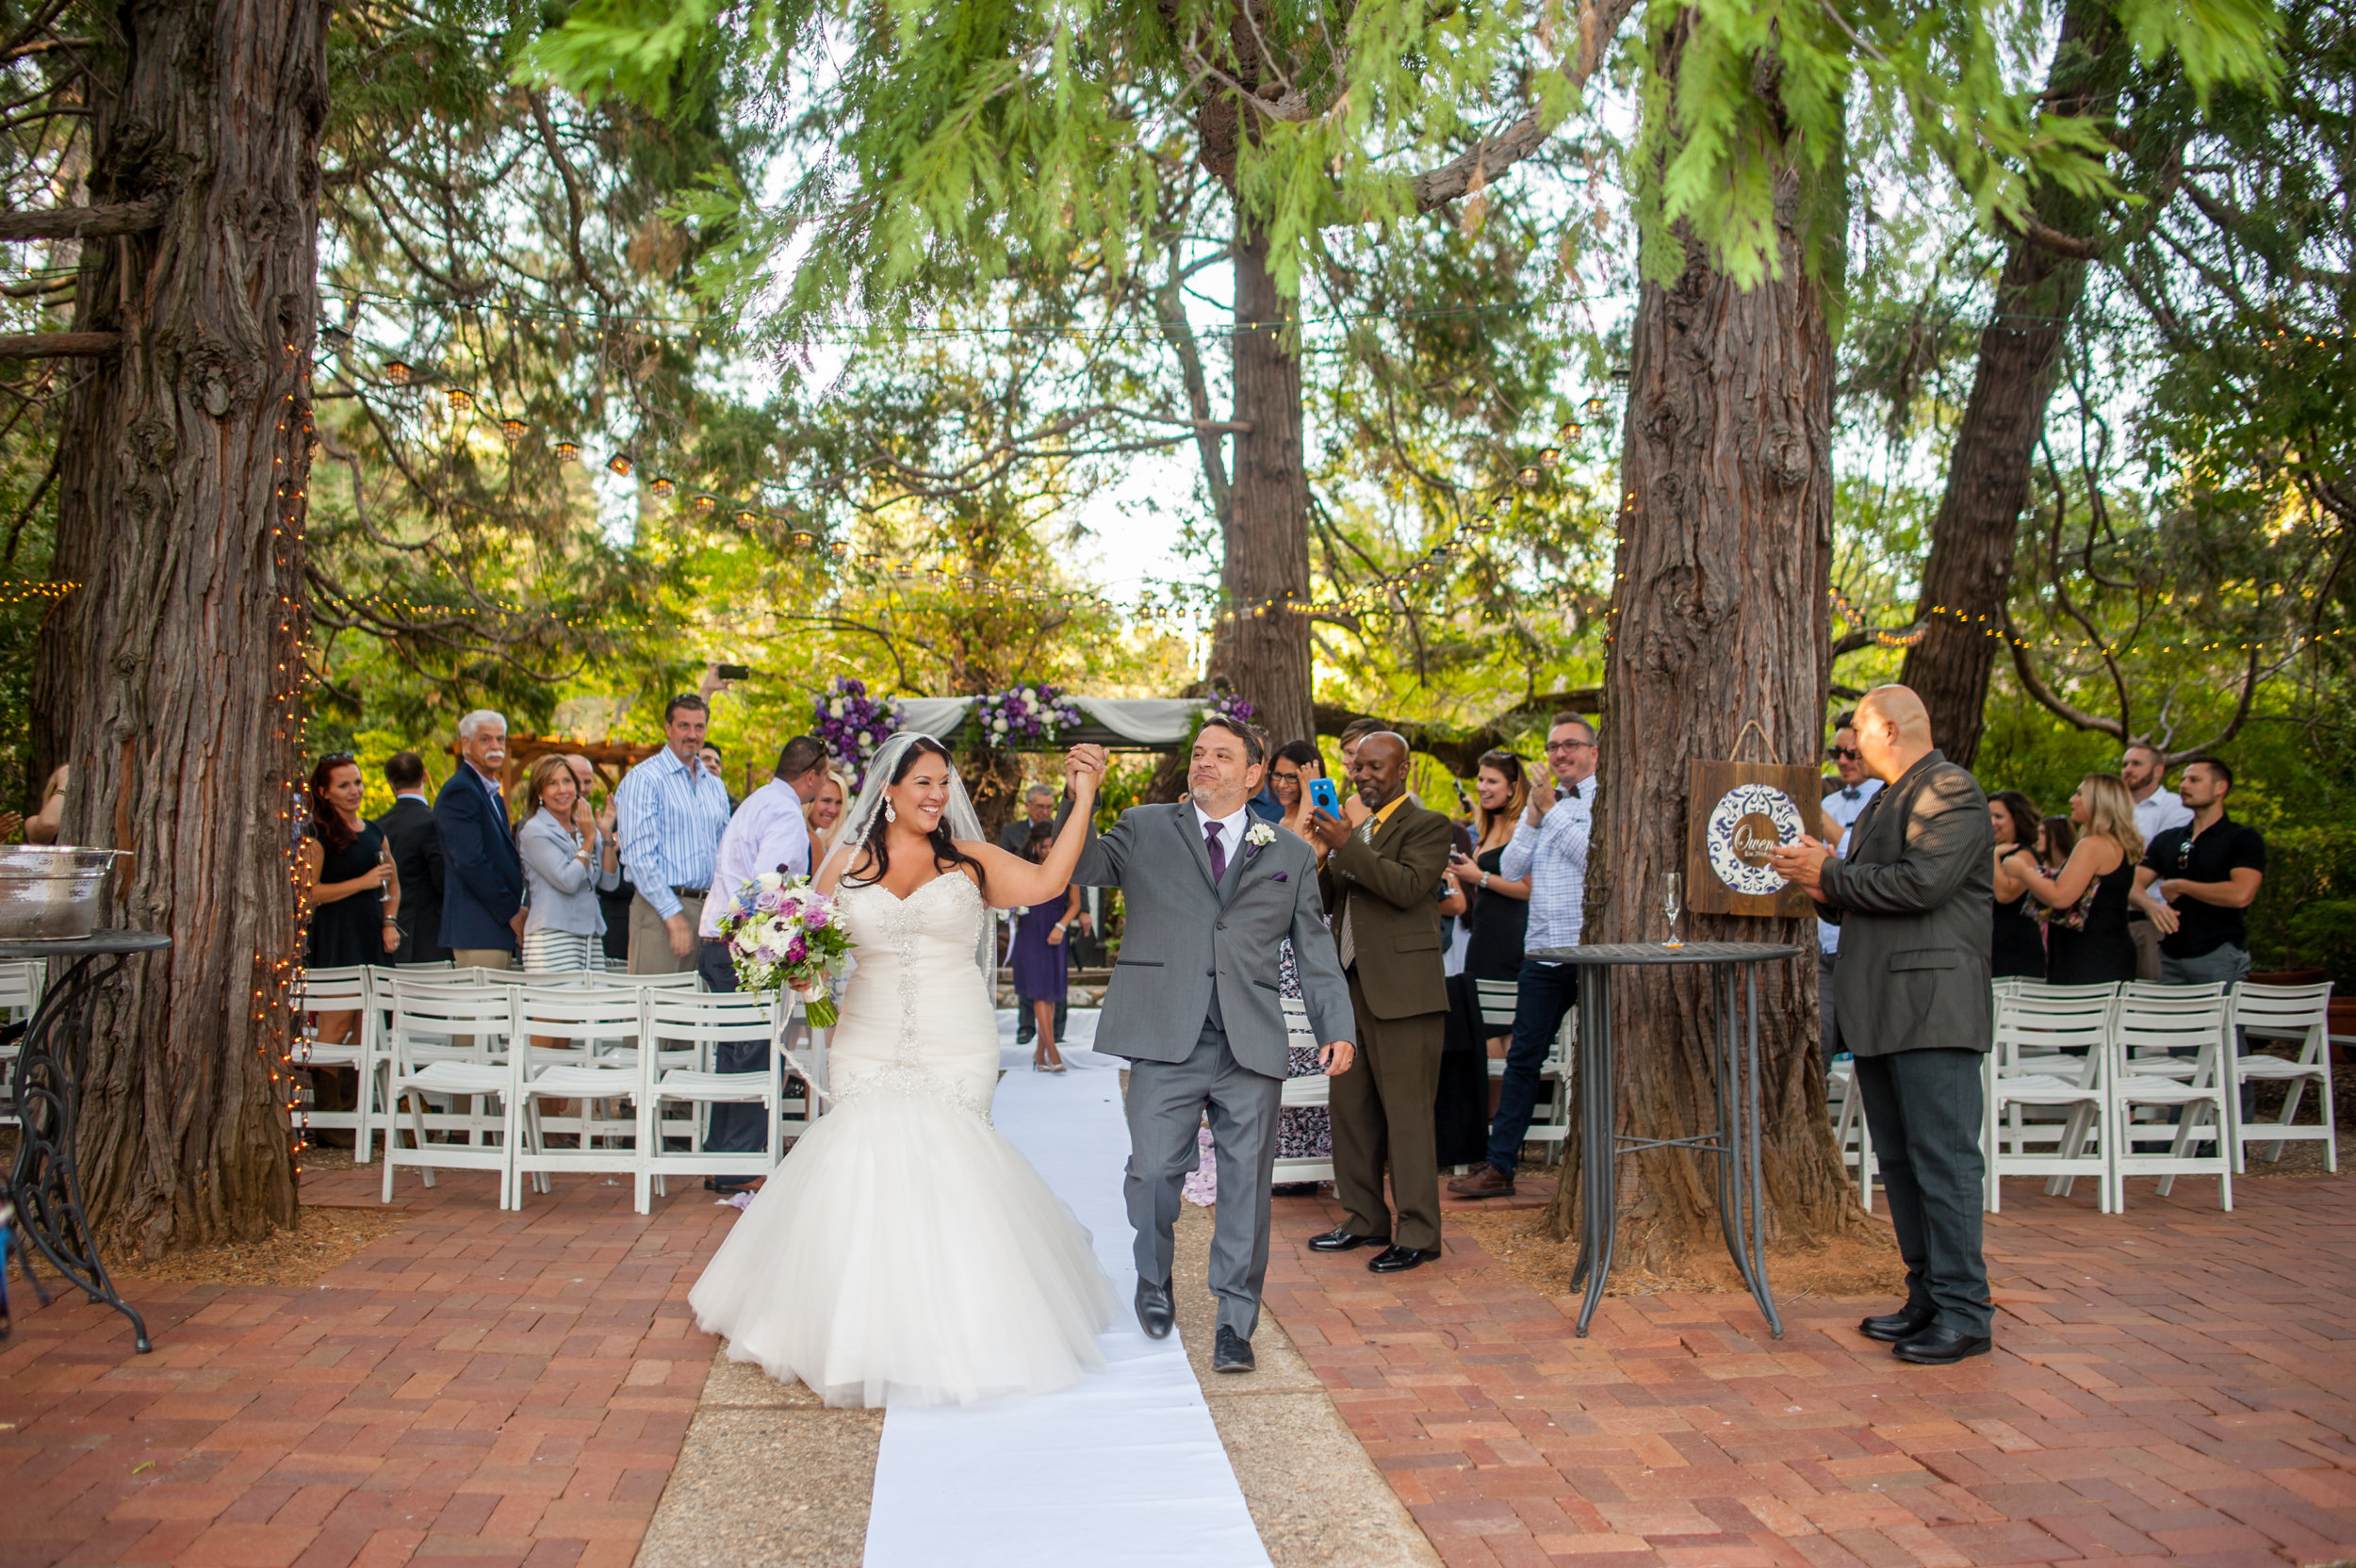 erika-seth-026-monte-verde-inn-sacramento-wedding-photographer-katherine-nicole-photography.JPG